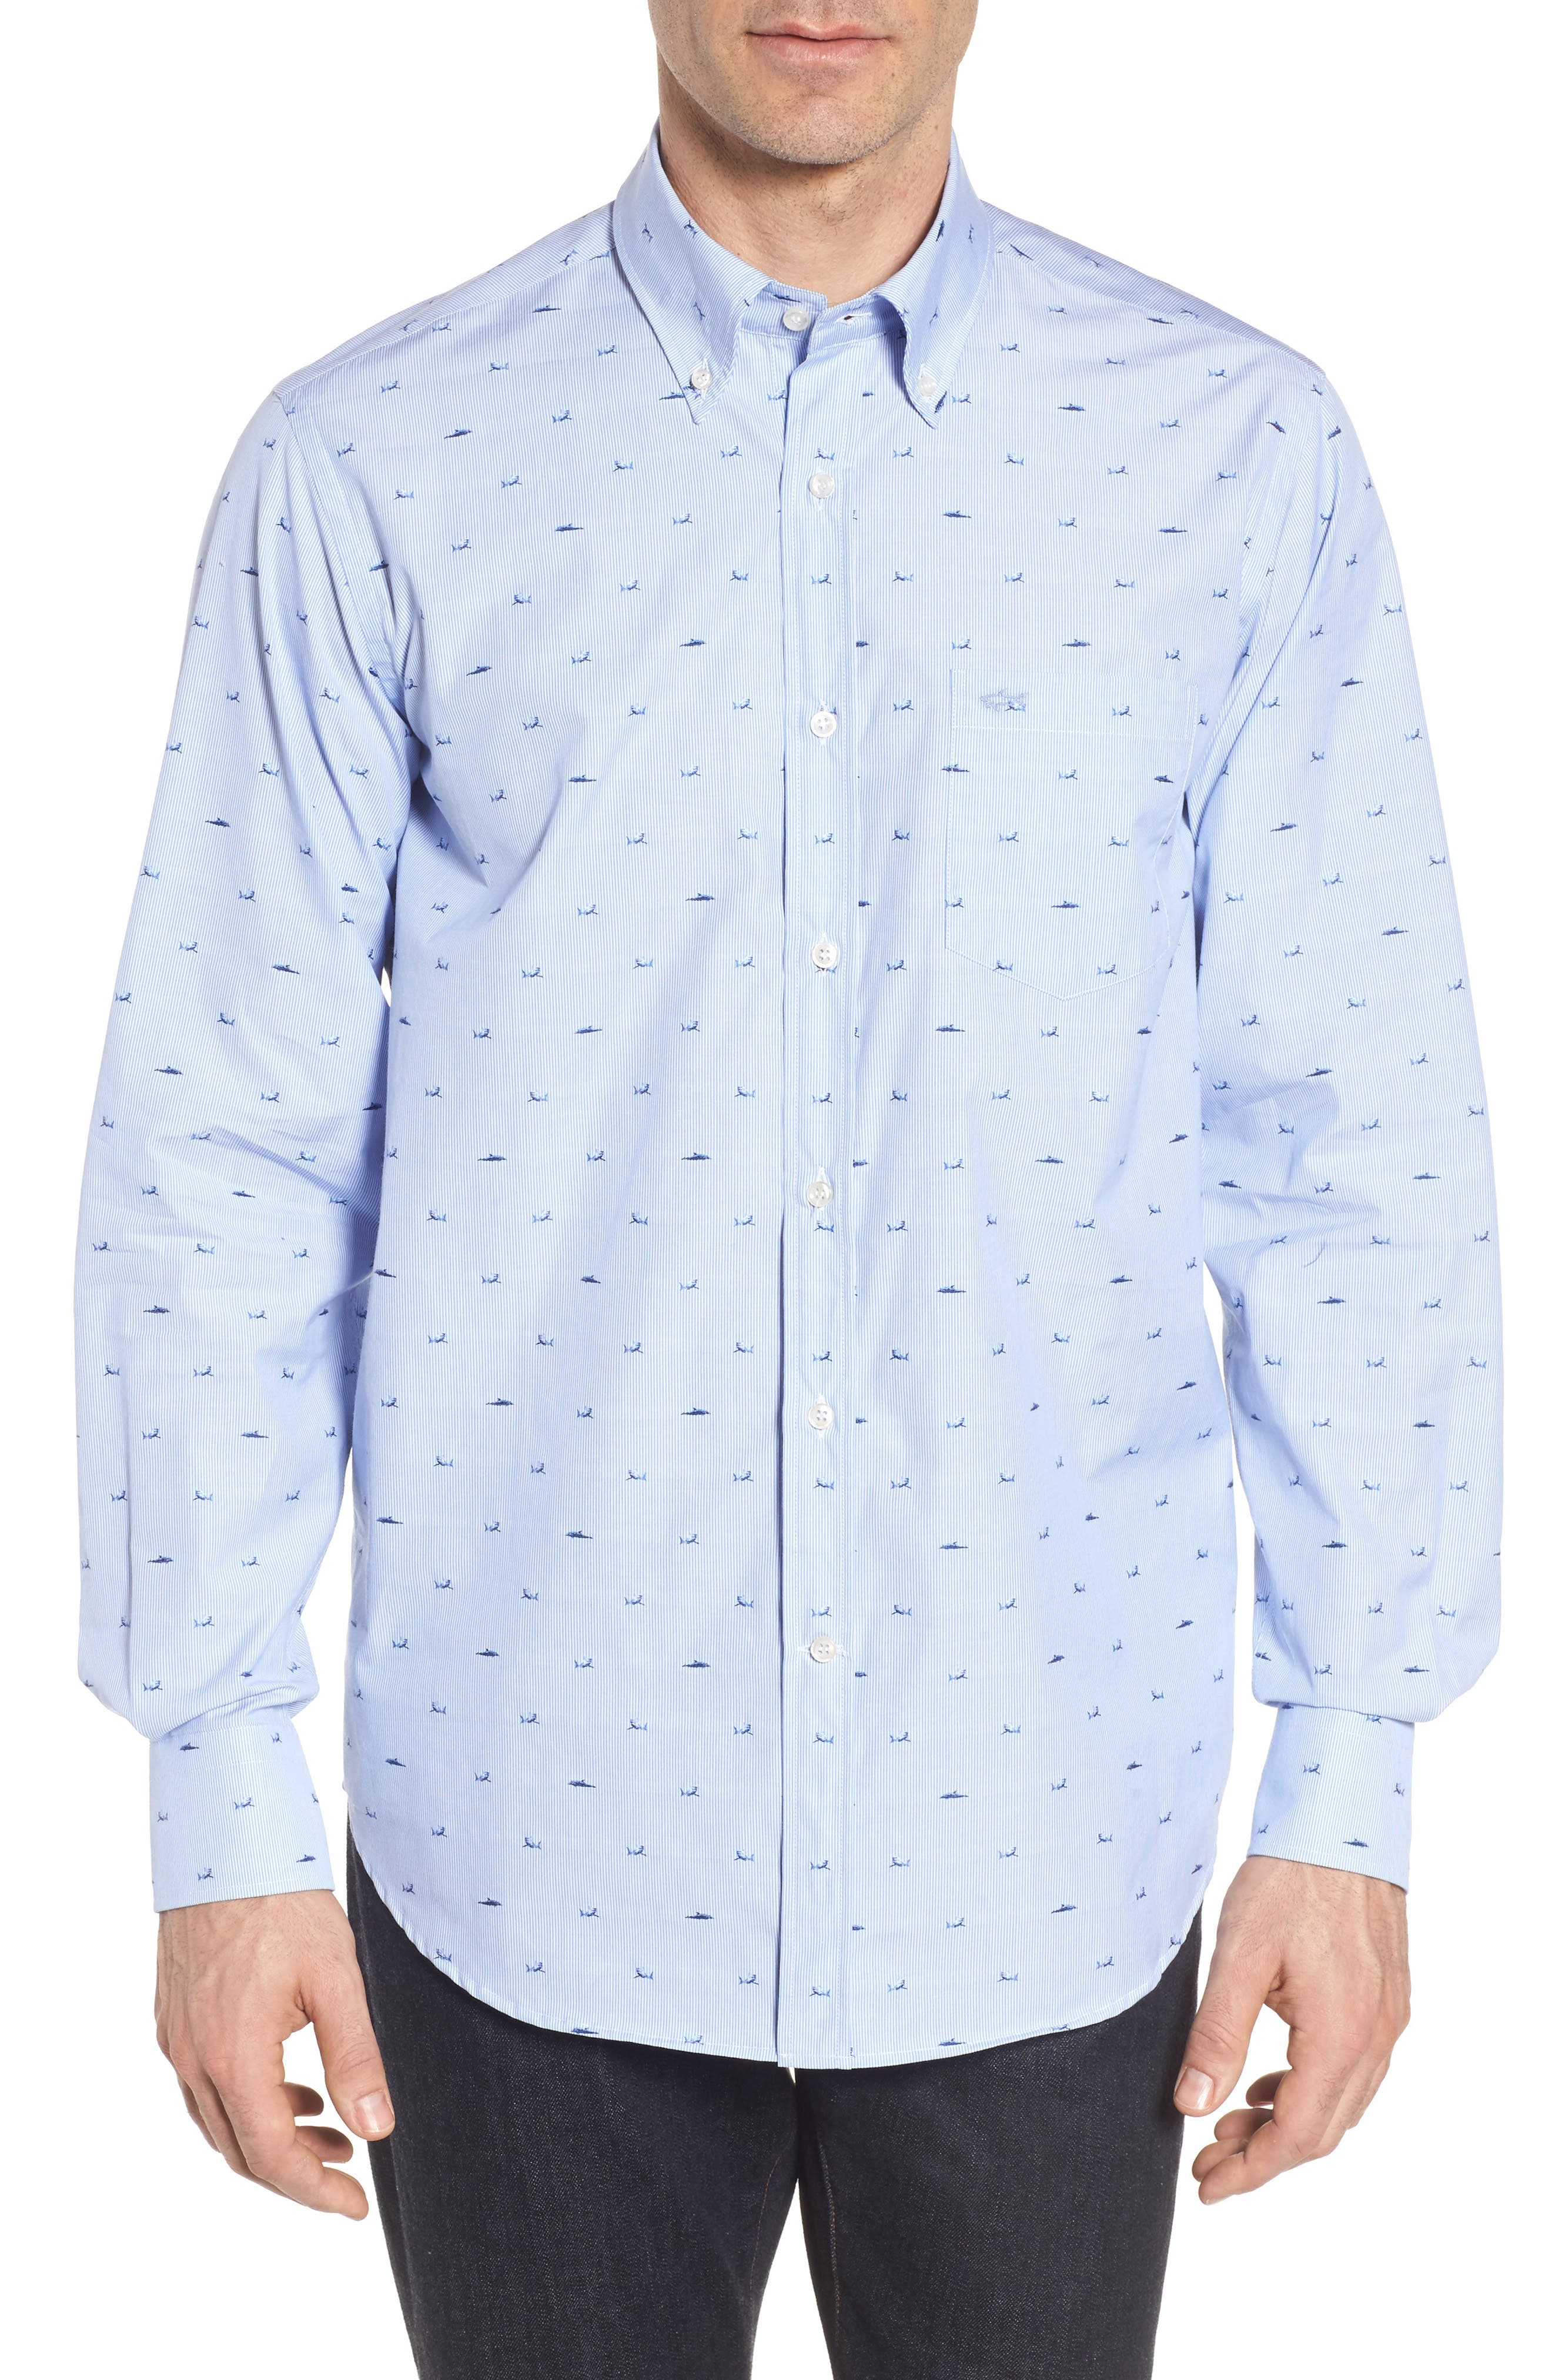 Paul&Shark Great White Jacquard Sport Shirt,                         Main,                         color, Blue